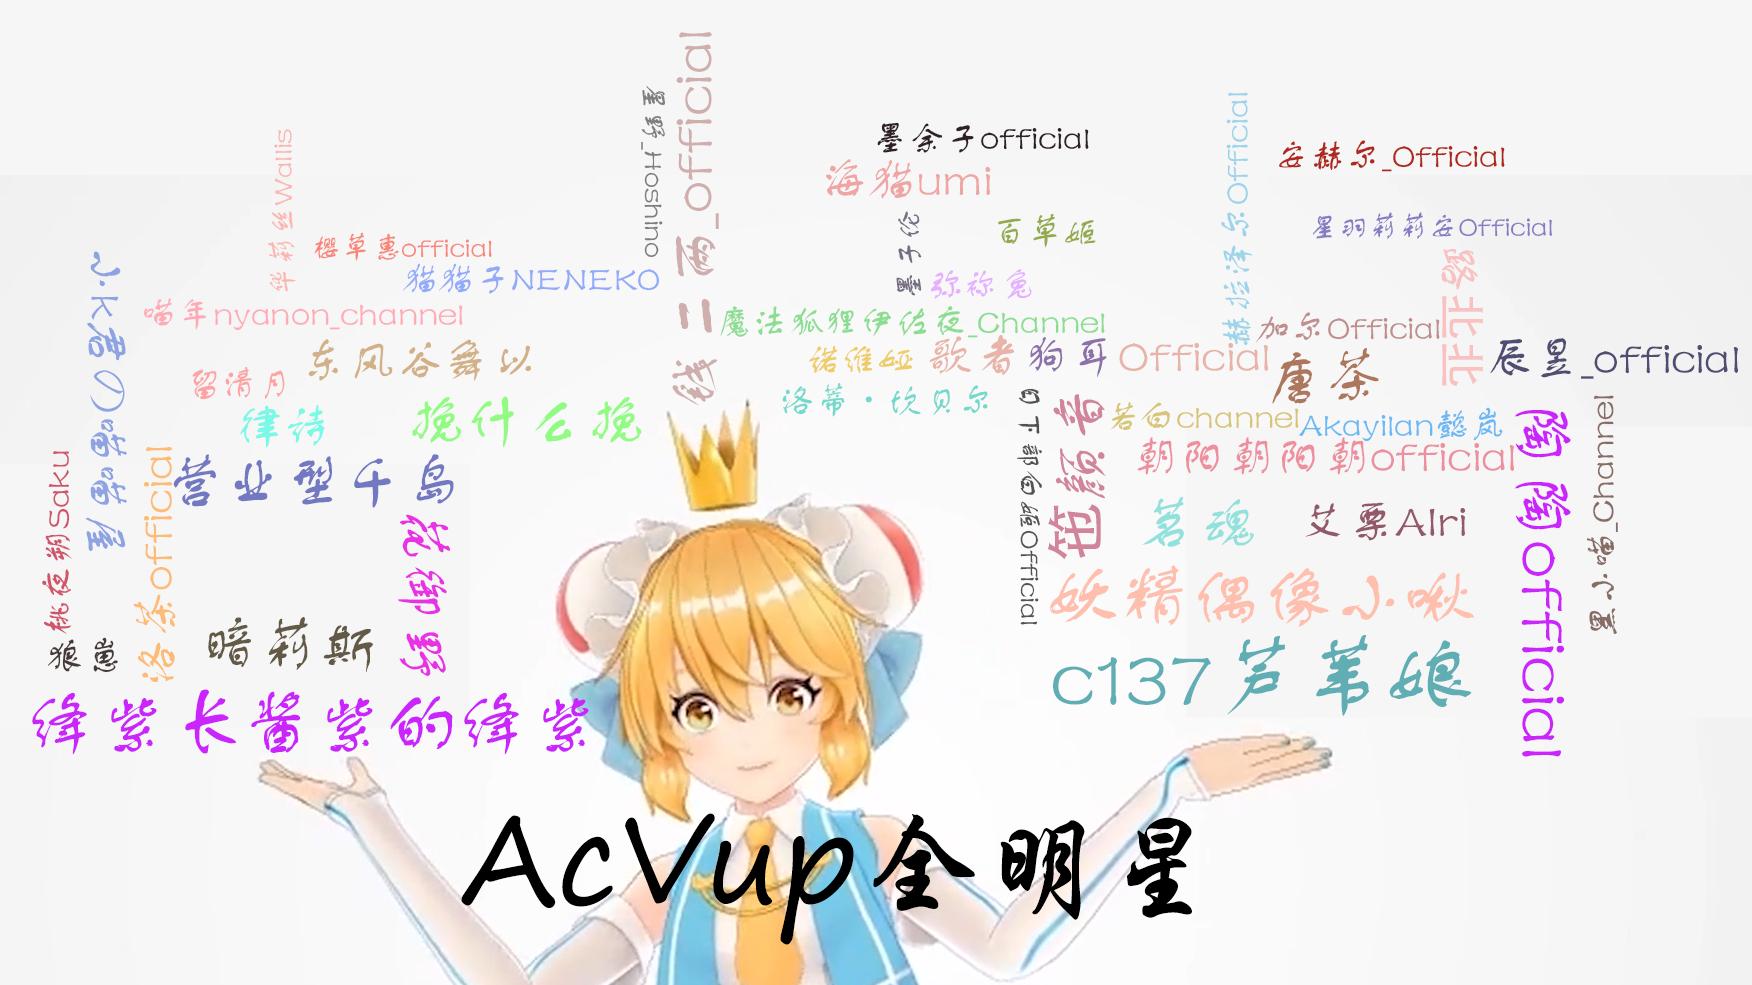 【AcVup全明星】火红的萨日朗